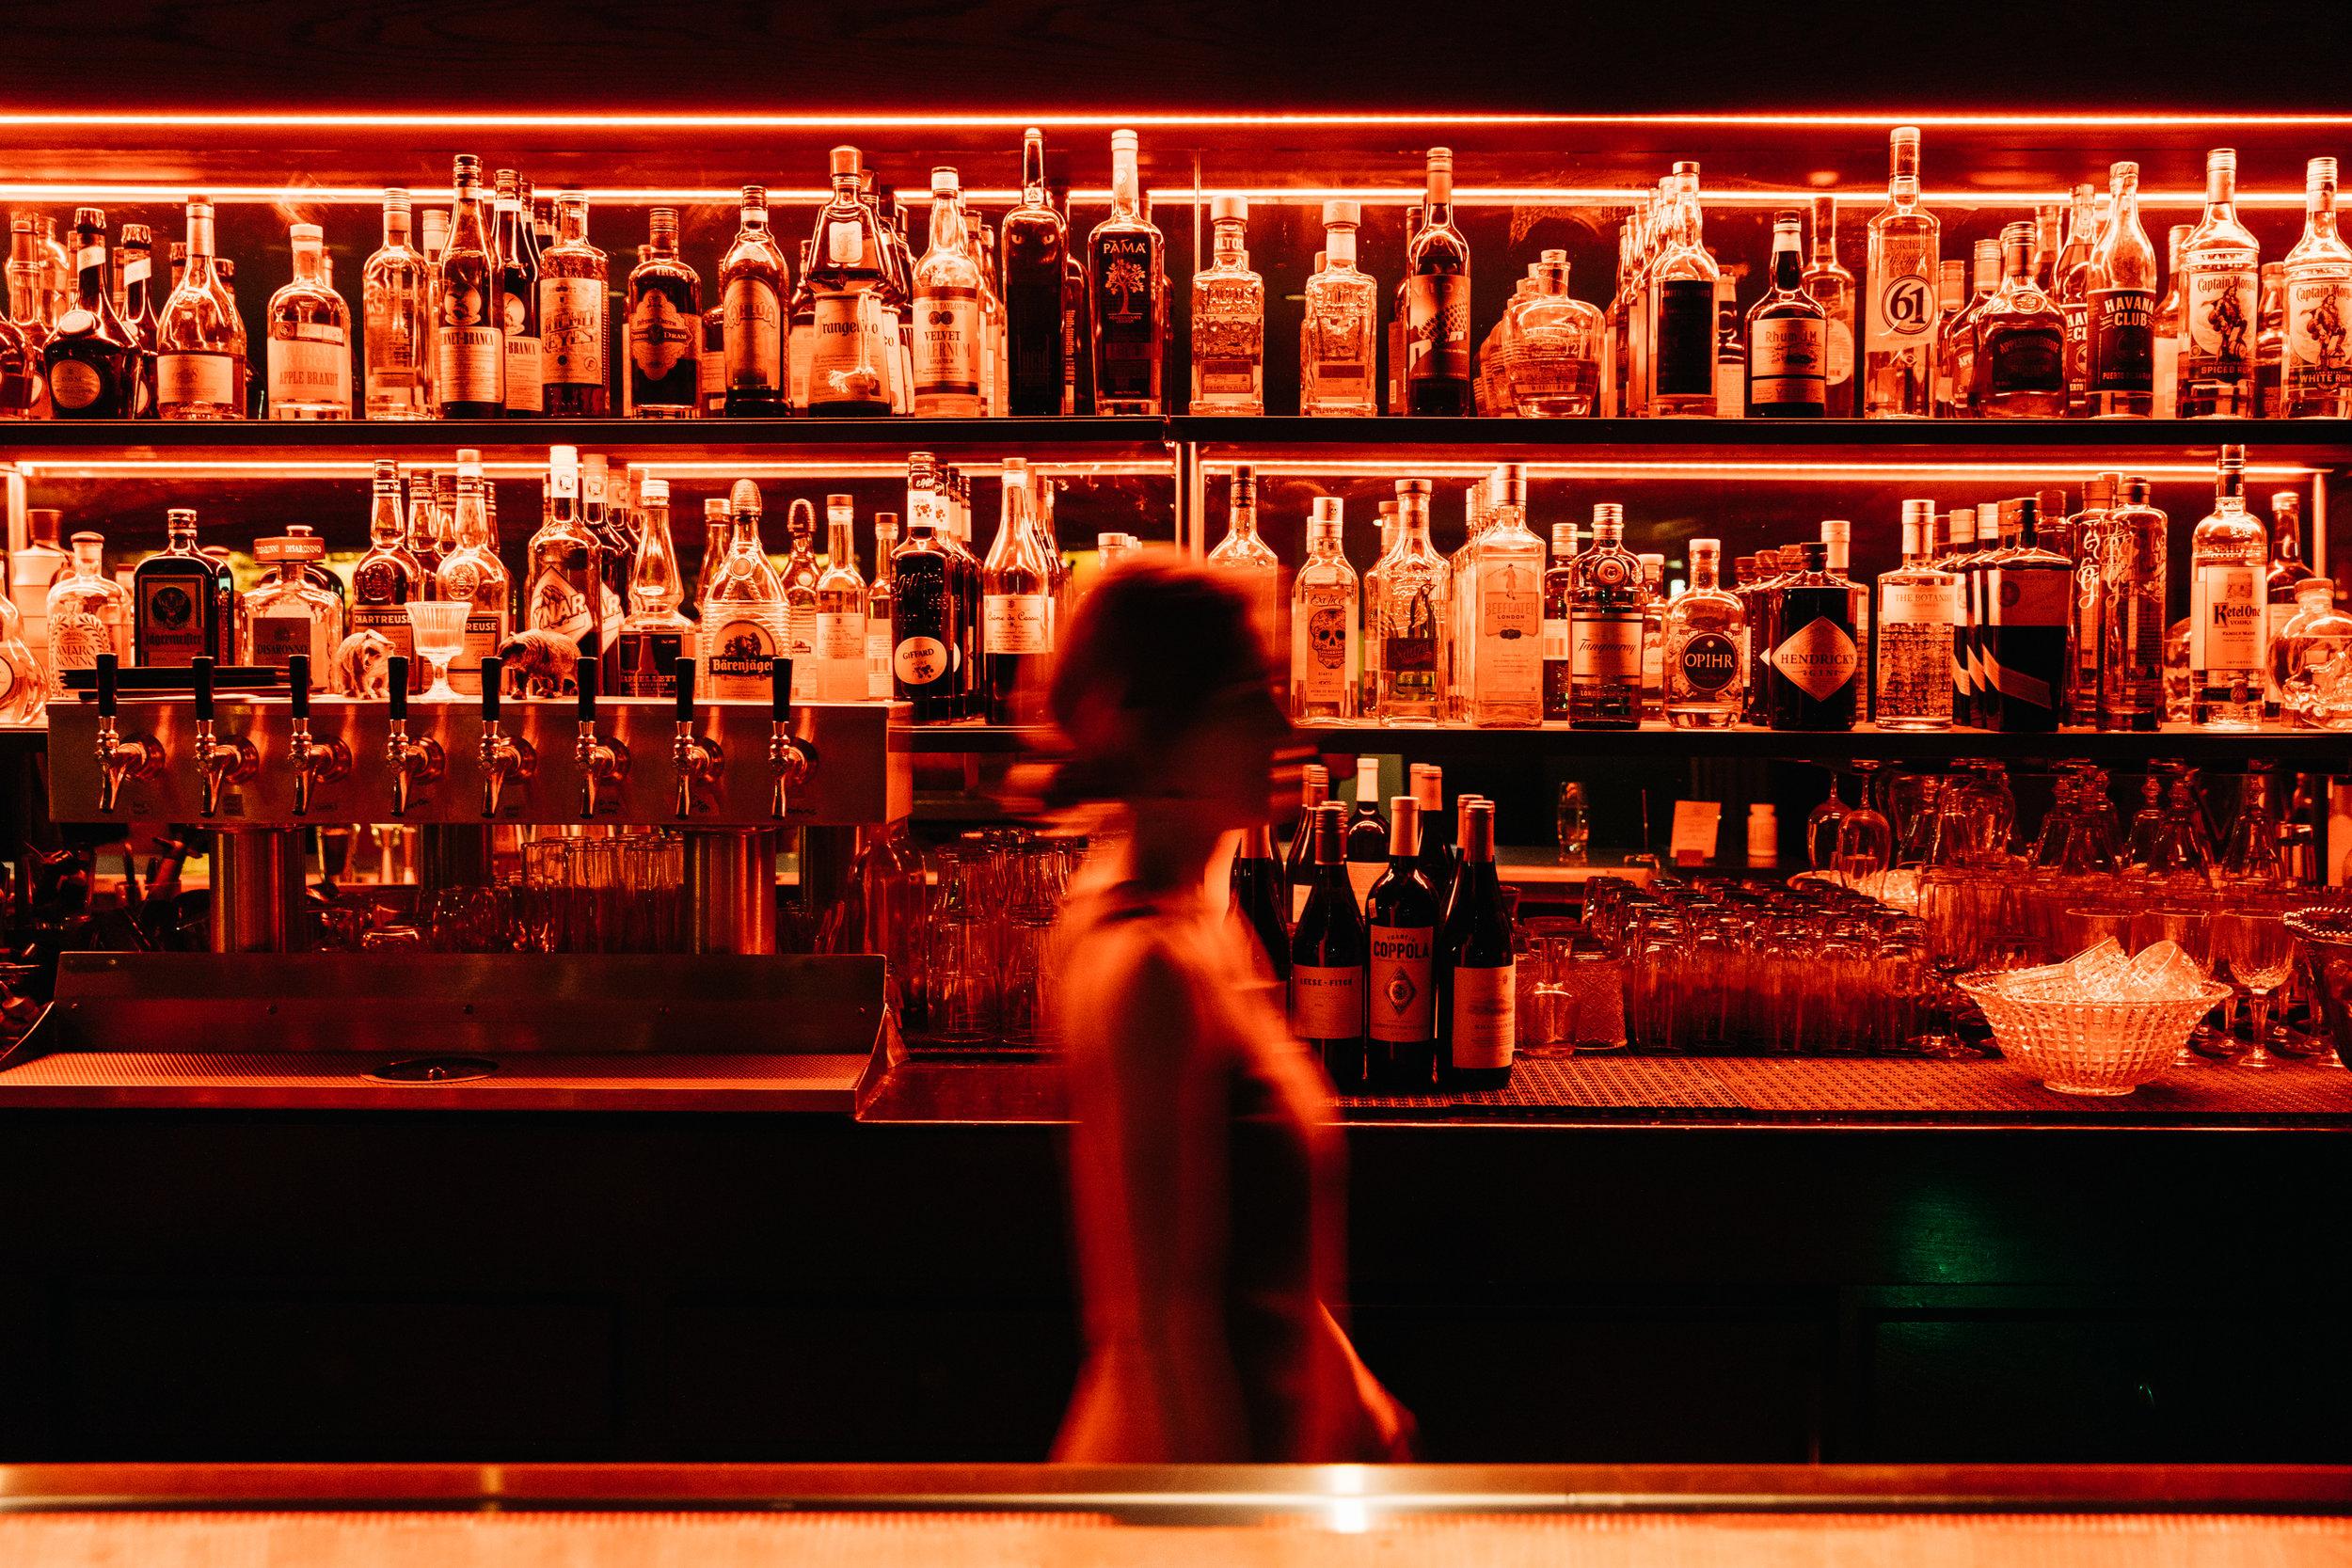 St. Burch Tavern | Smith Hanes. Bar at the Den